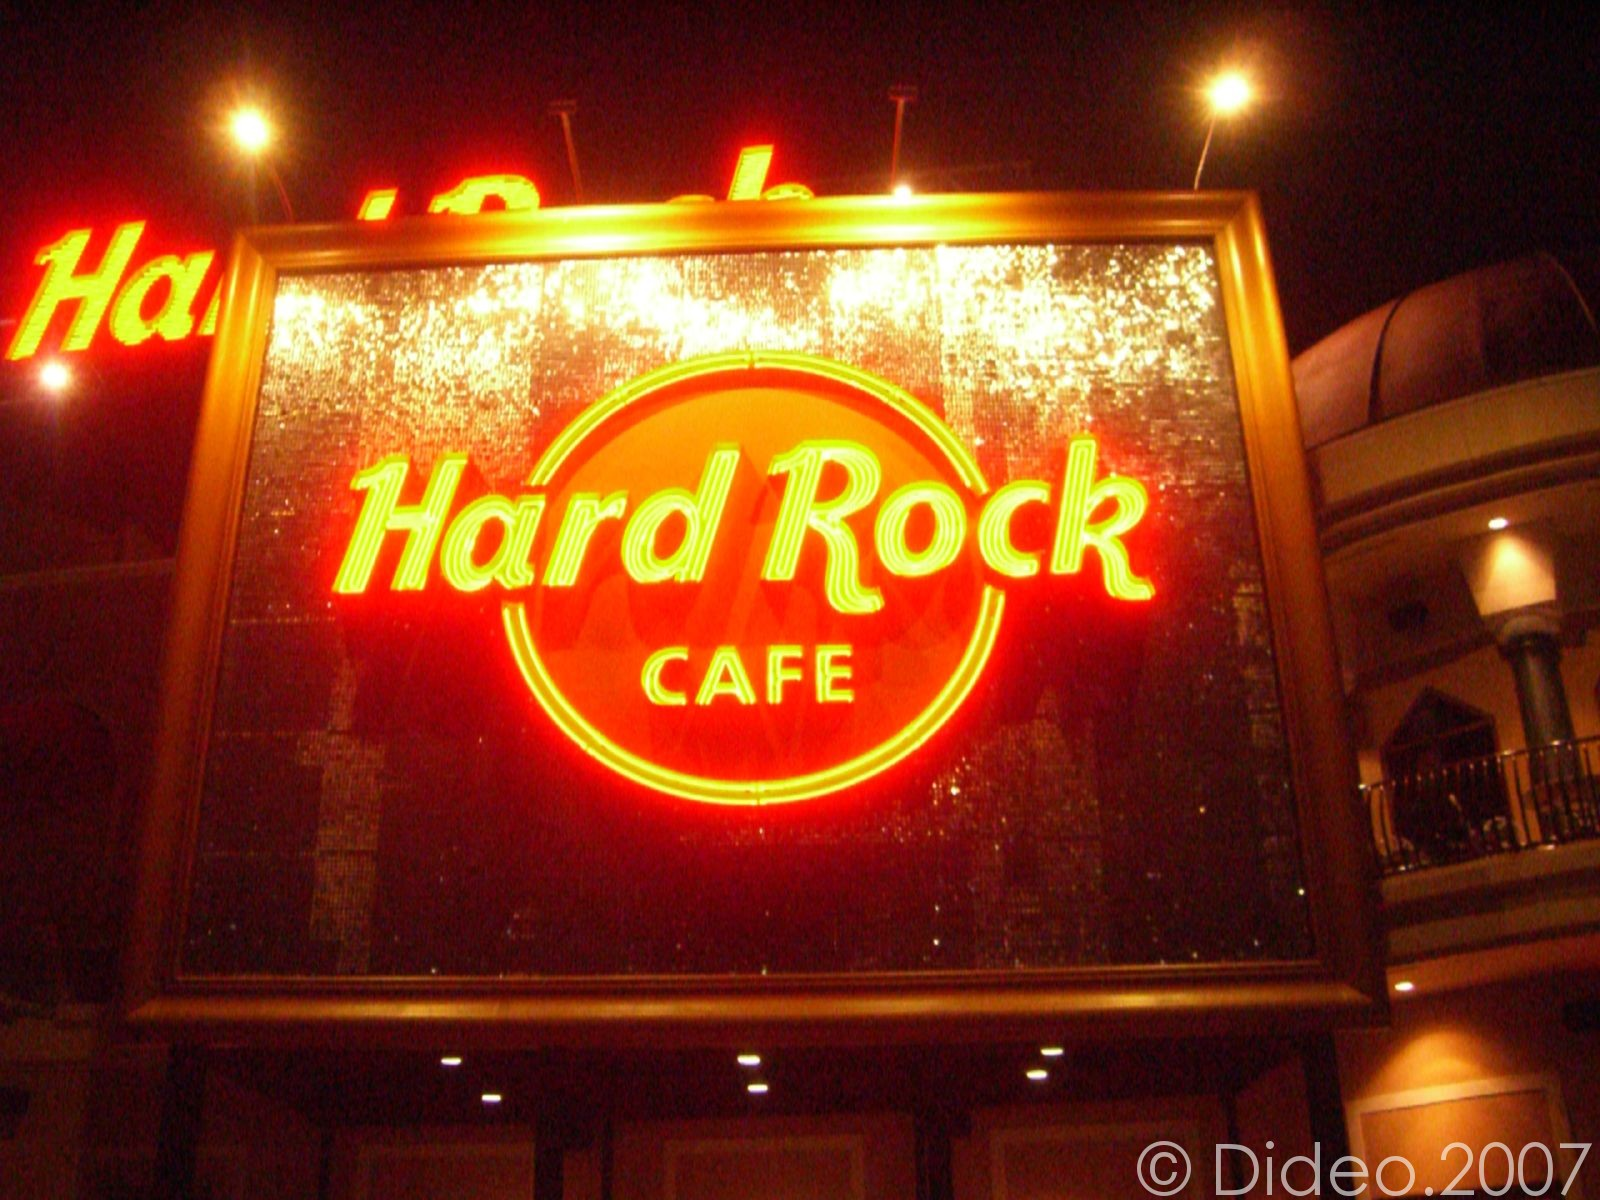 Http Www Hardrock Com Locations Cafes Cafe Aspx Locationid  Mibenumid